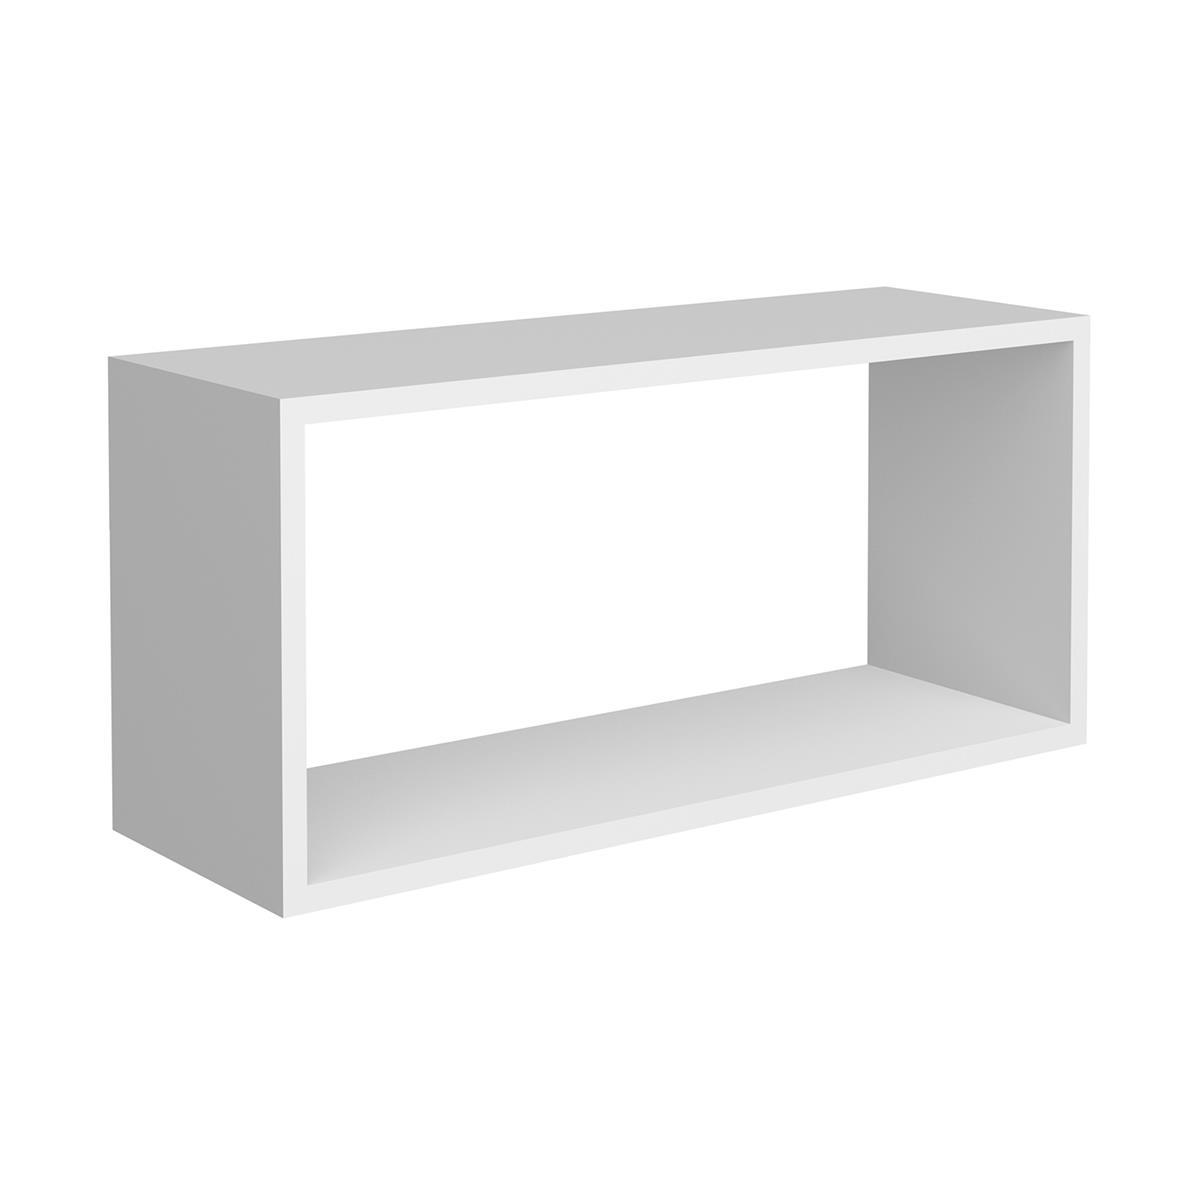 Nicho Decorativo Gaam MDF 28x20x60Cm Branco